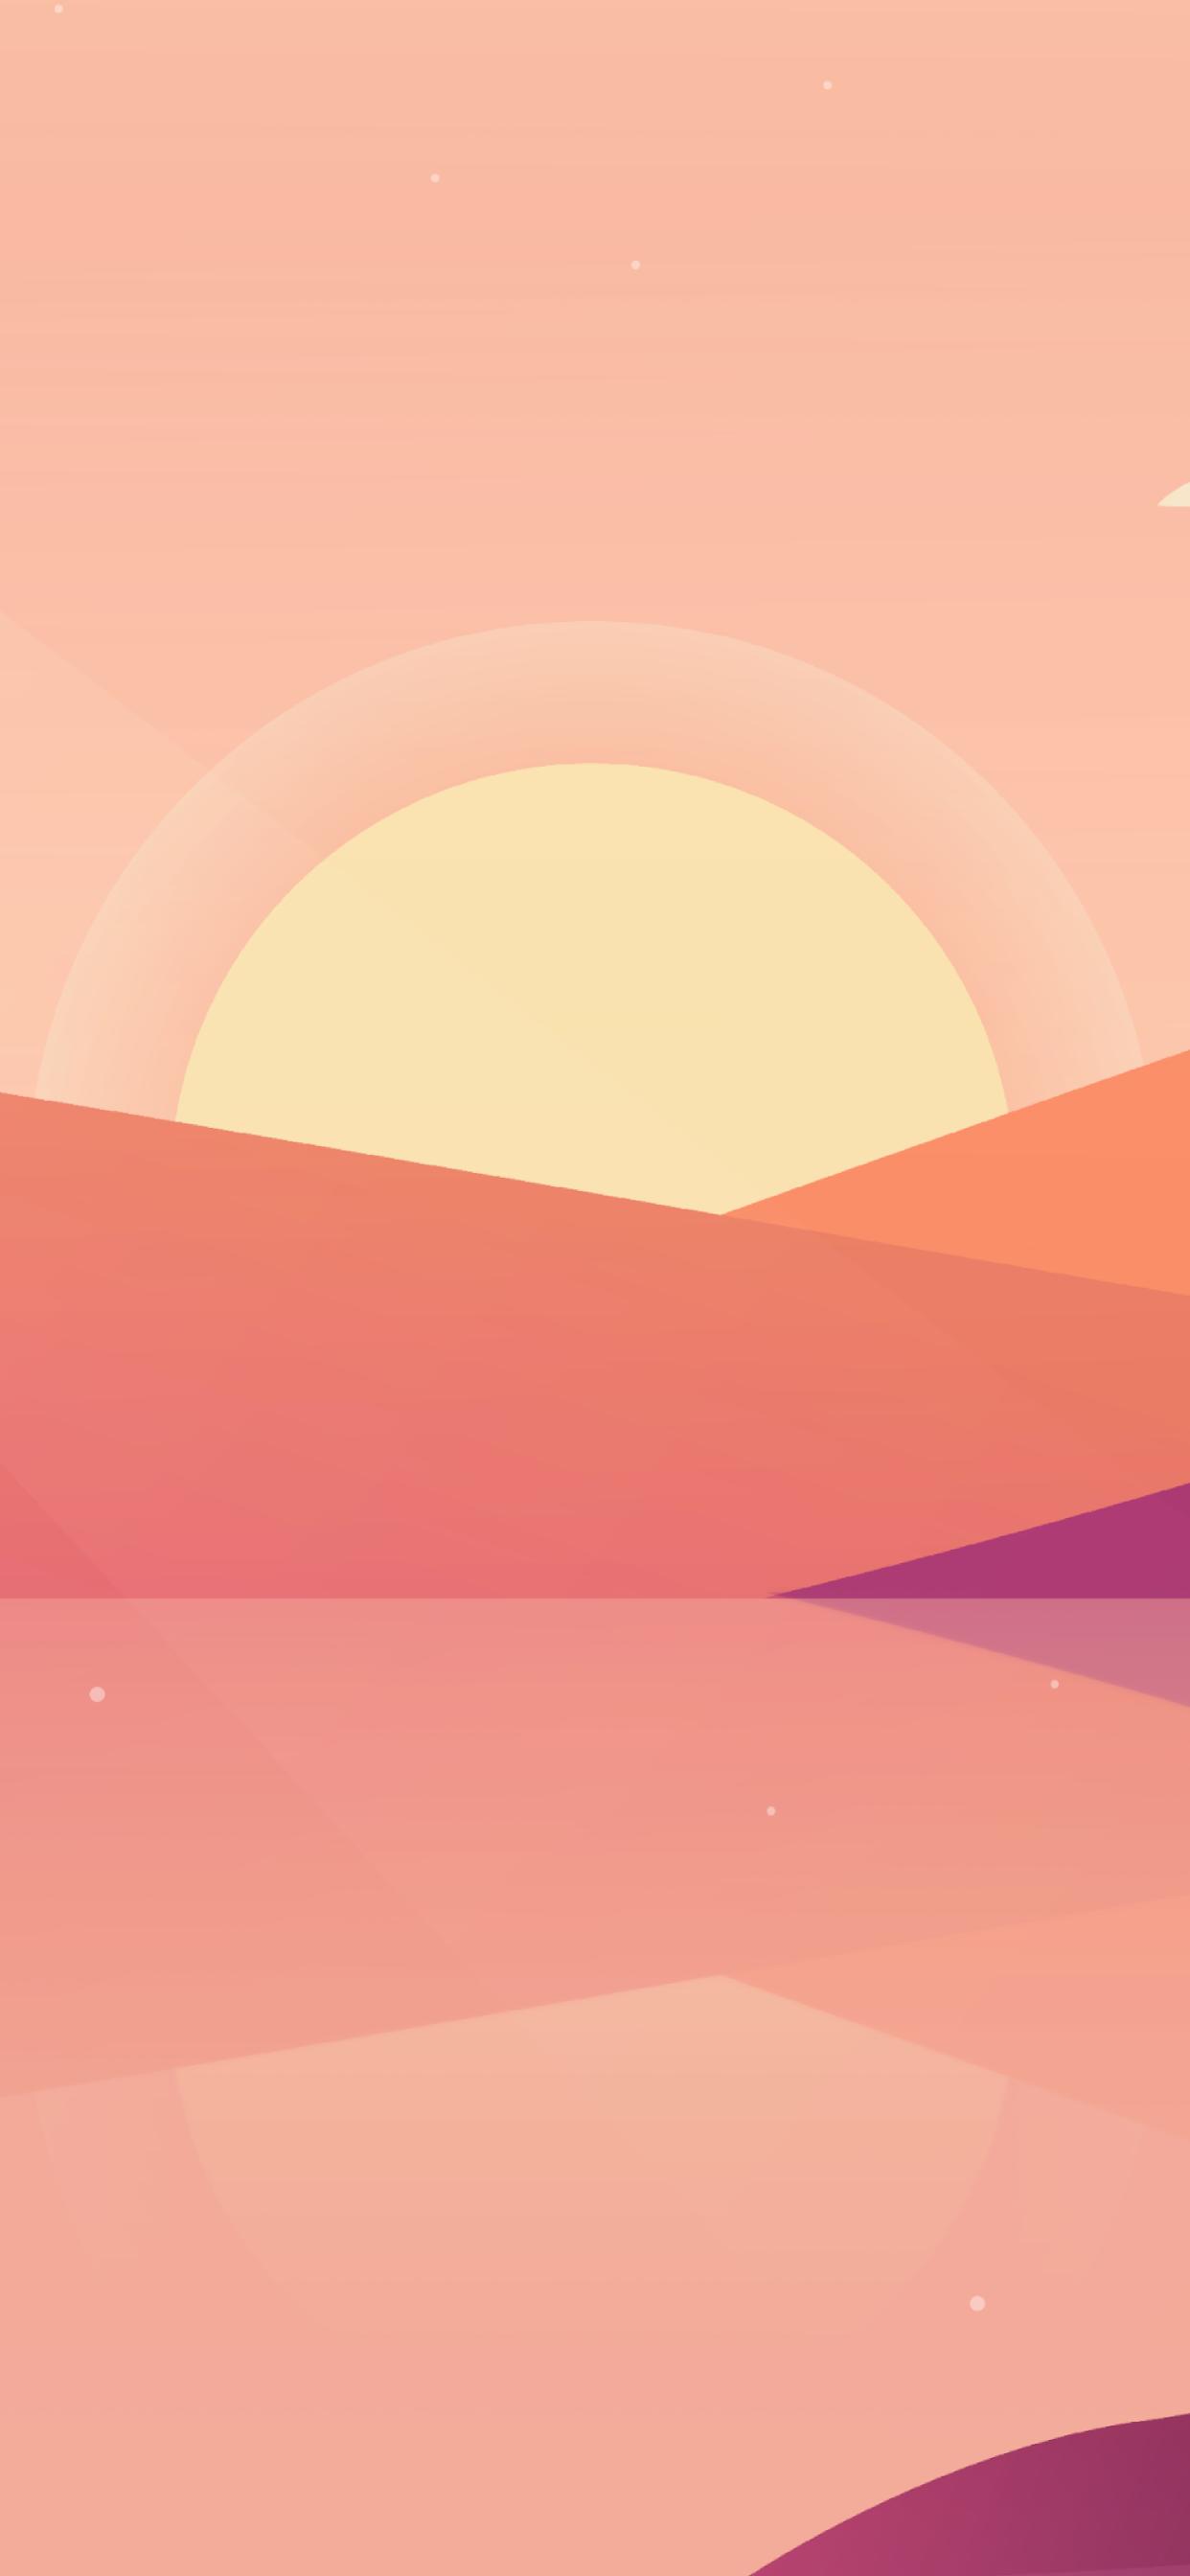 iPhone wallpapers illustration sunset hills Illustration